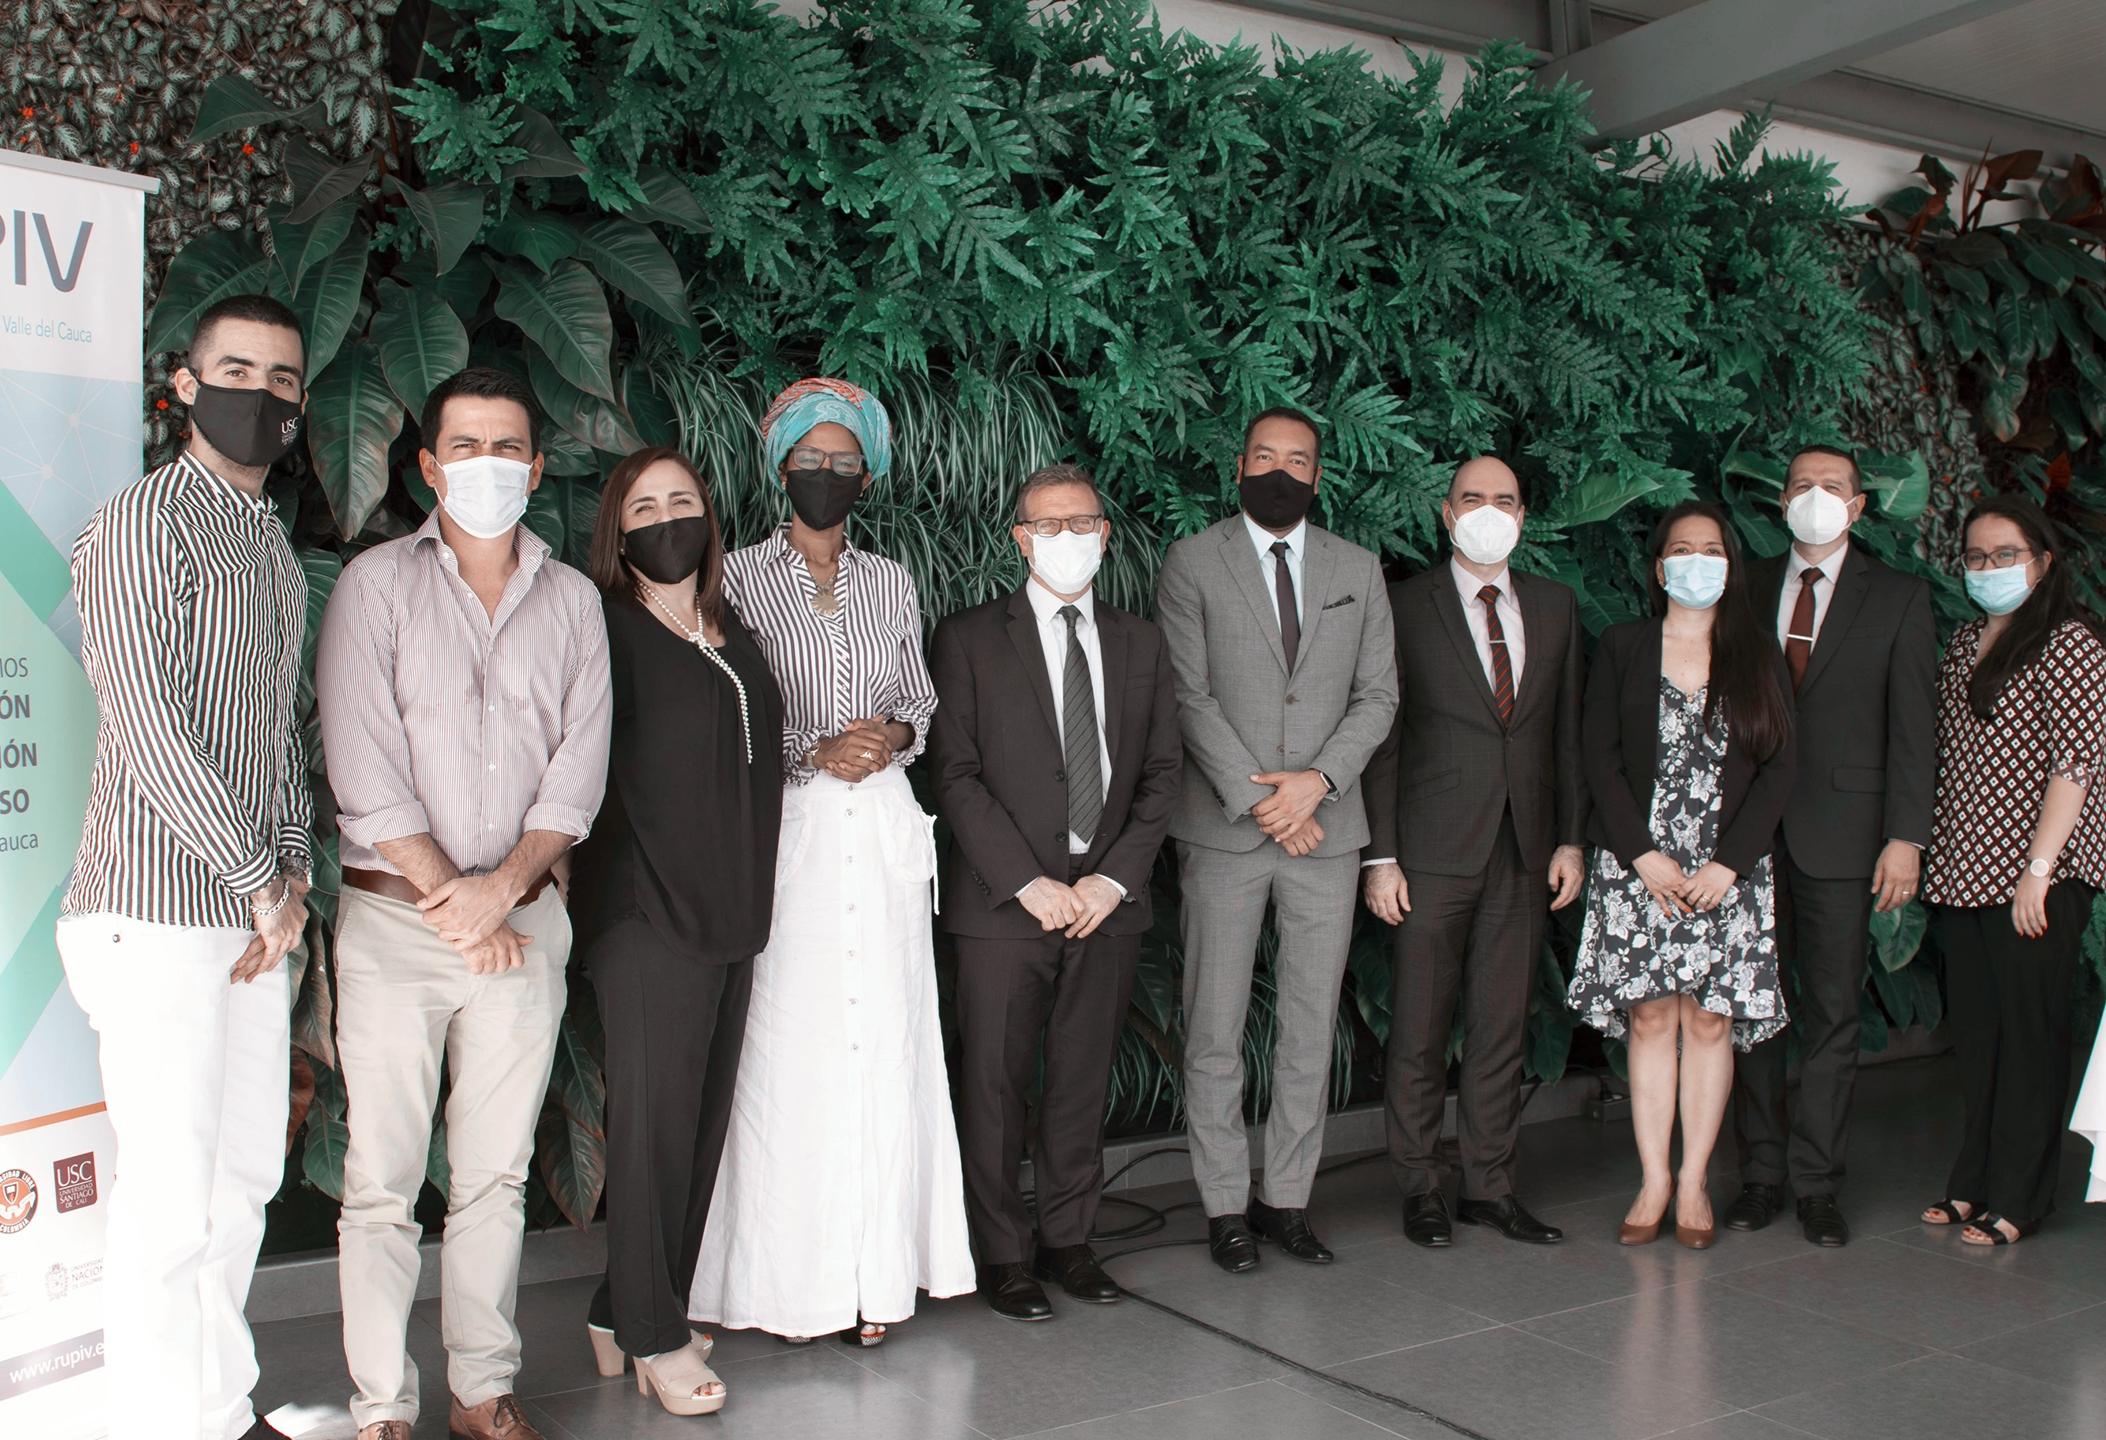 La RUPIV recibió la visita del Dr. Christian Cantor, Embajador de Israel en Colombia